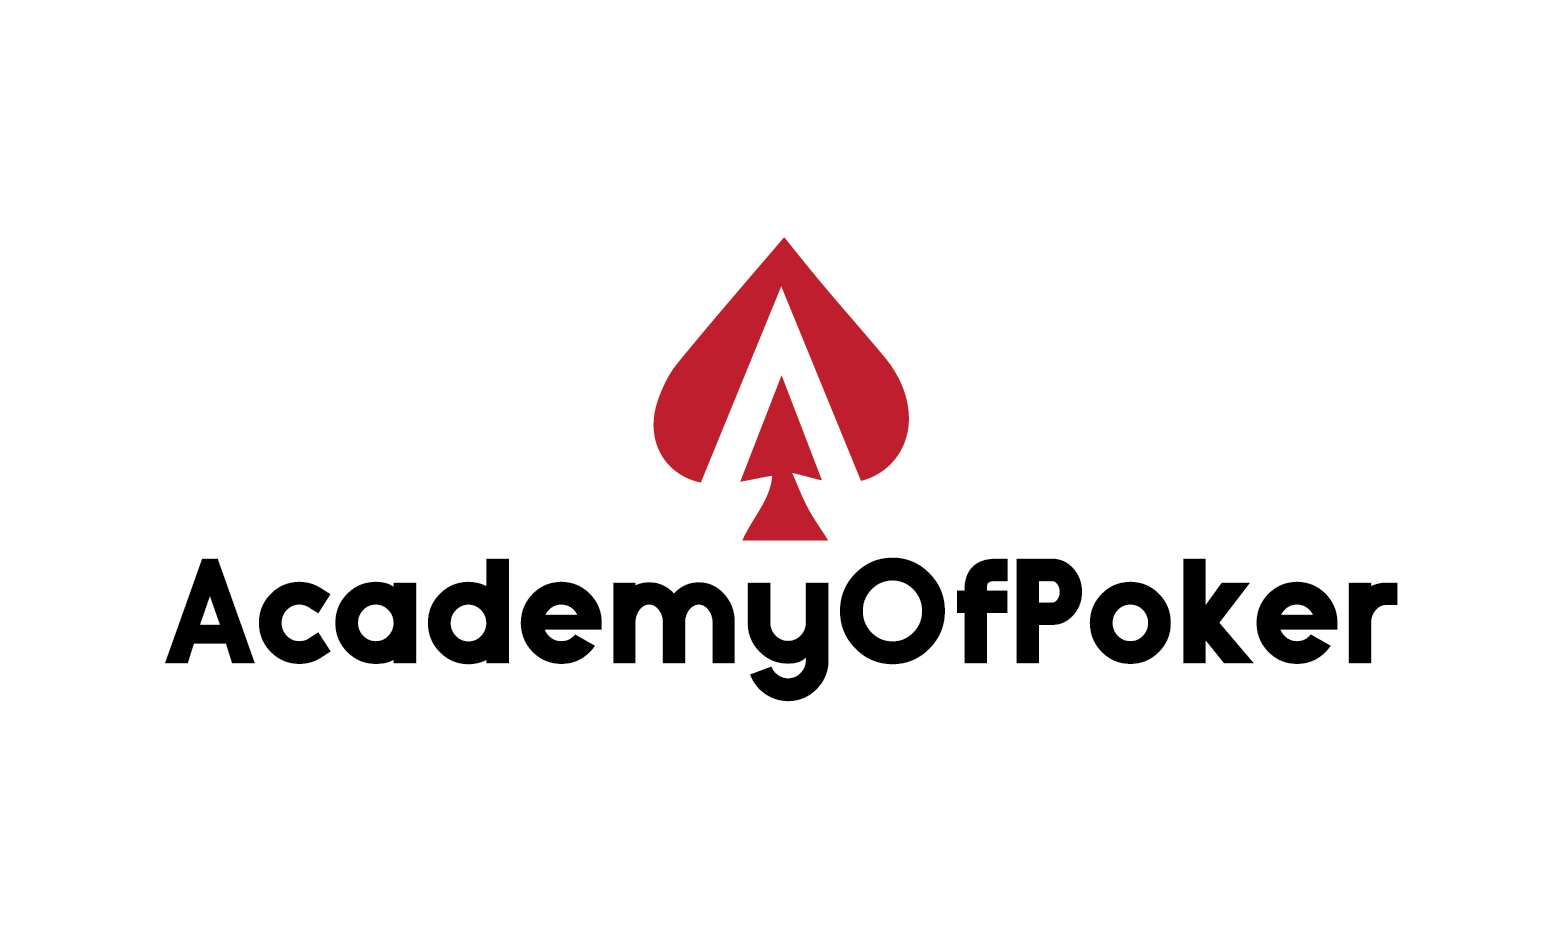 AcademyOfPoker.com